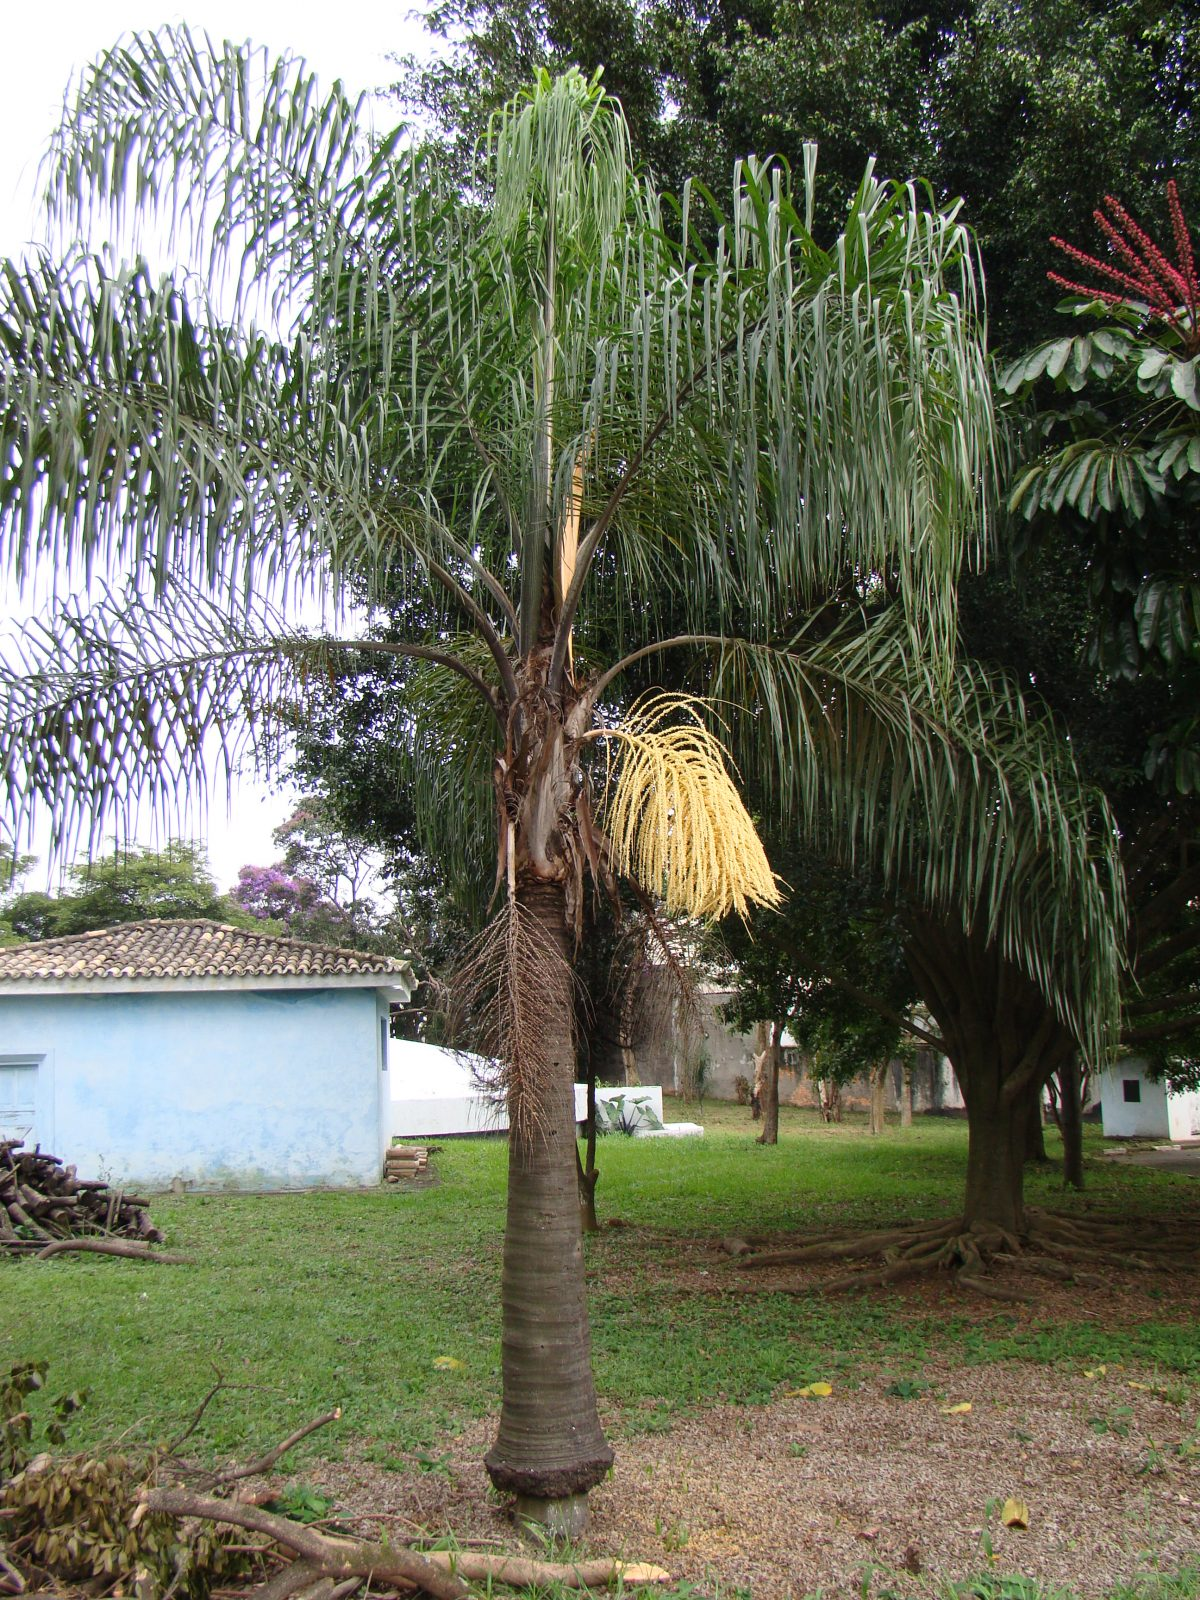 Syagrus romanzoffiana, una palmera muy común